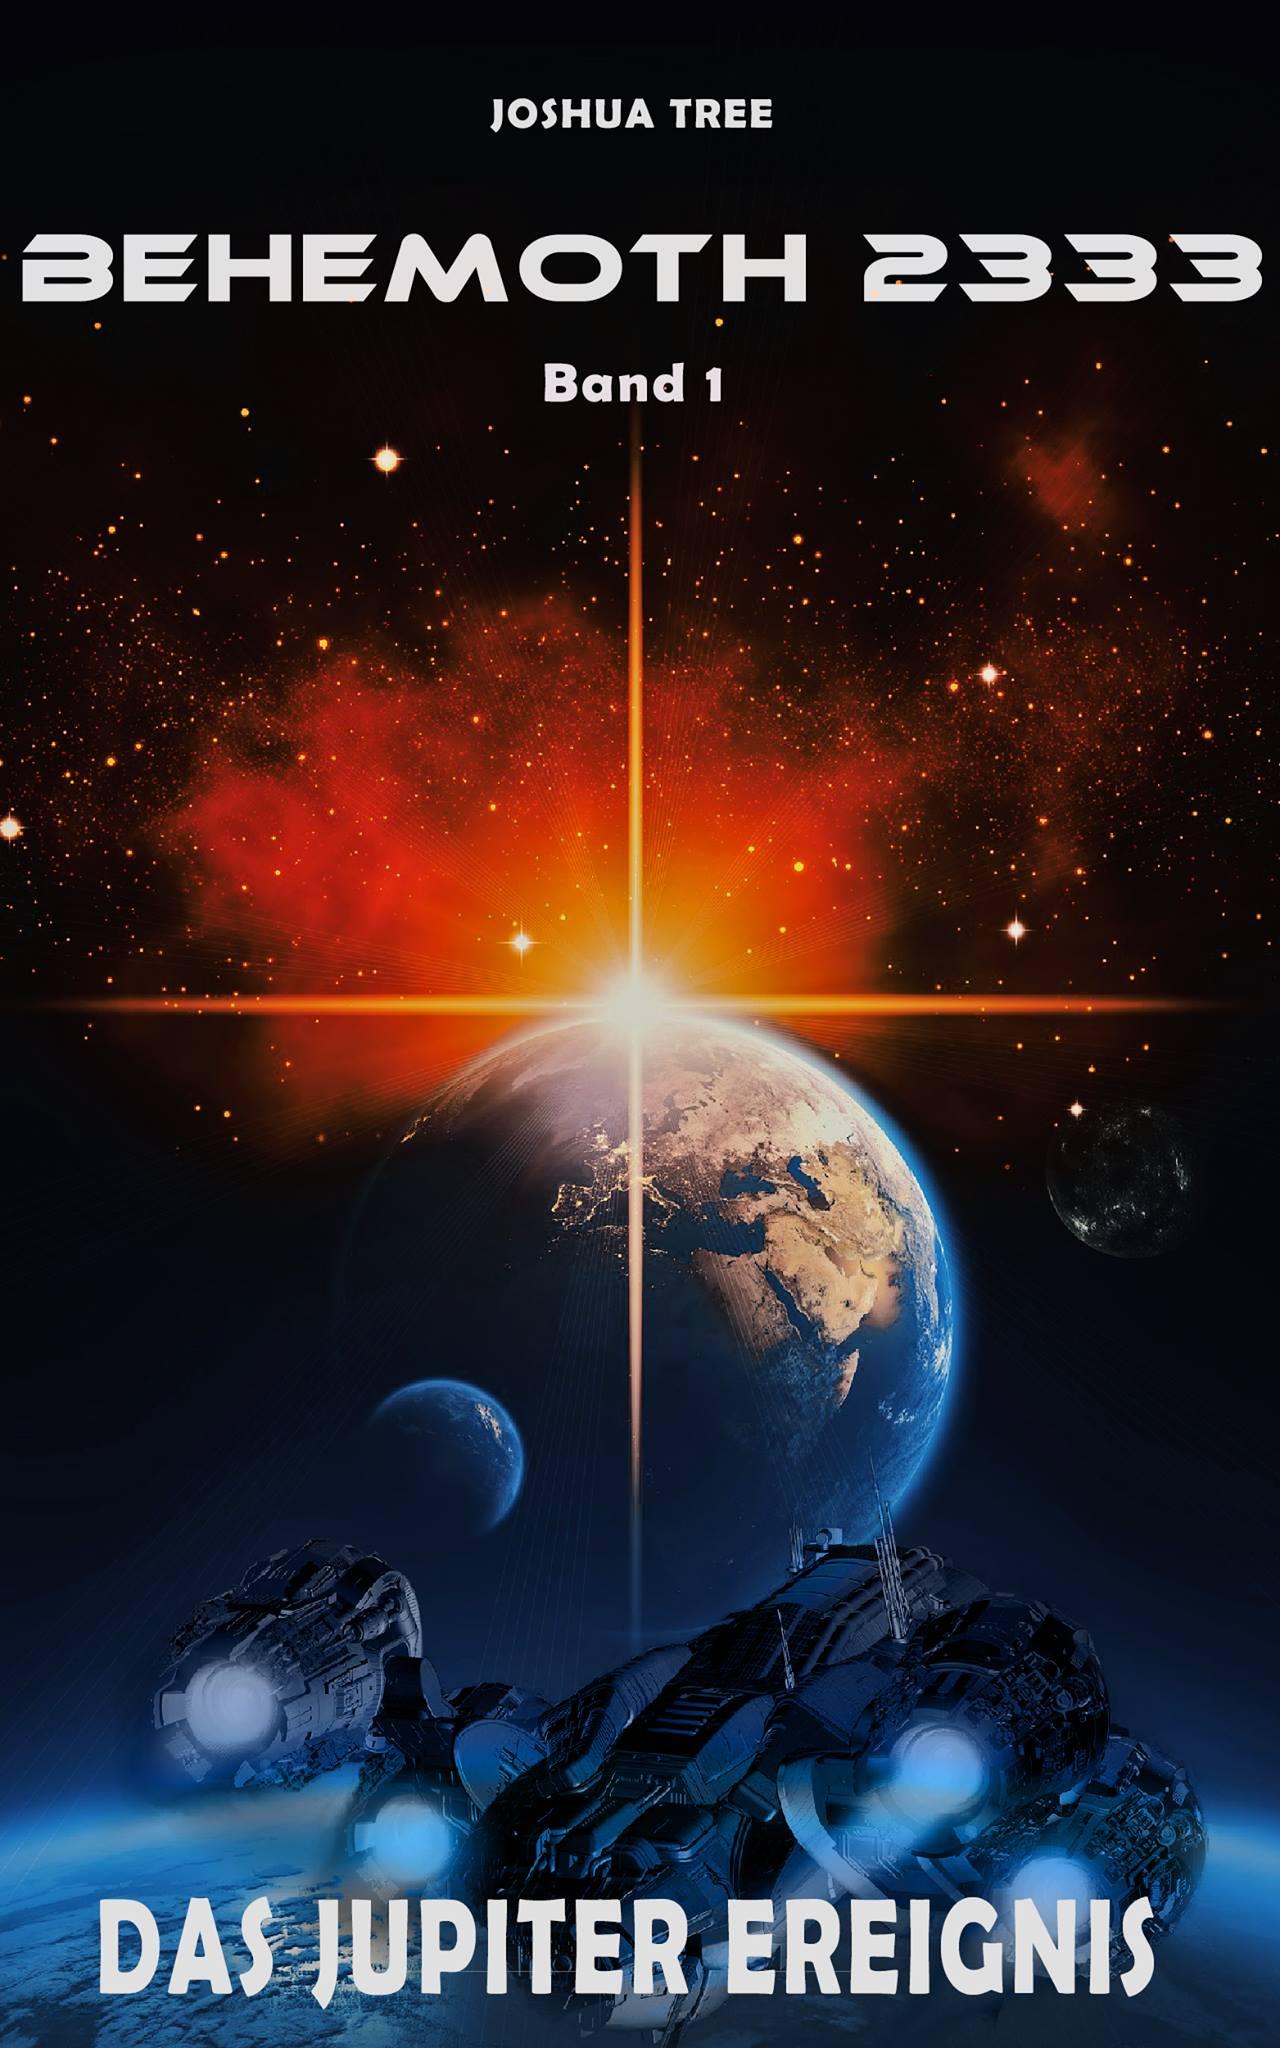 Behemoth 2333 - Band 01 Das Jupiter Ereignis Joshua Tree